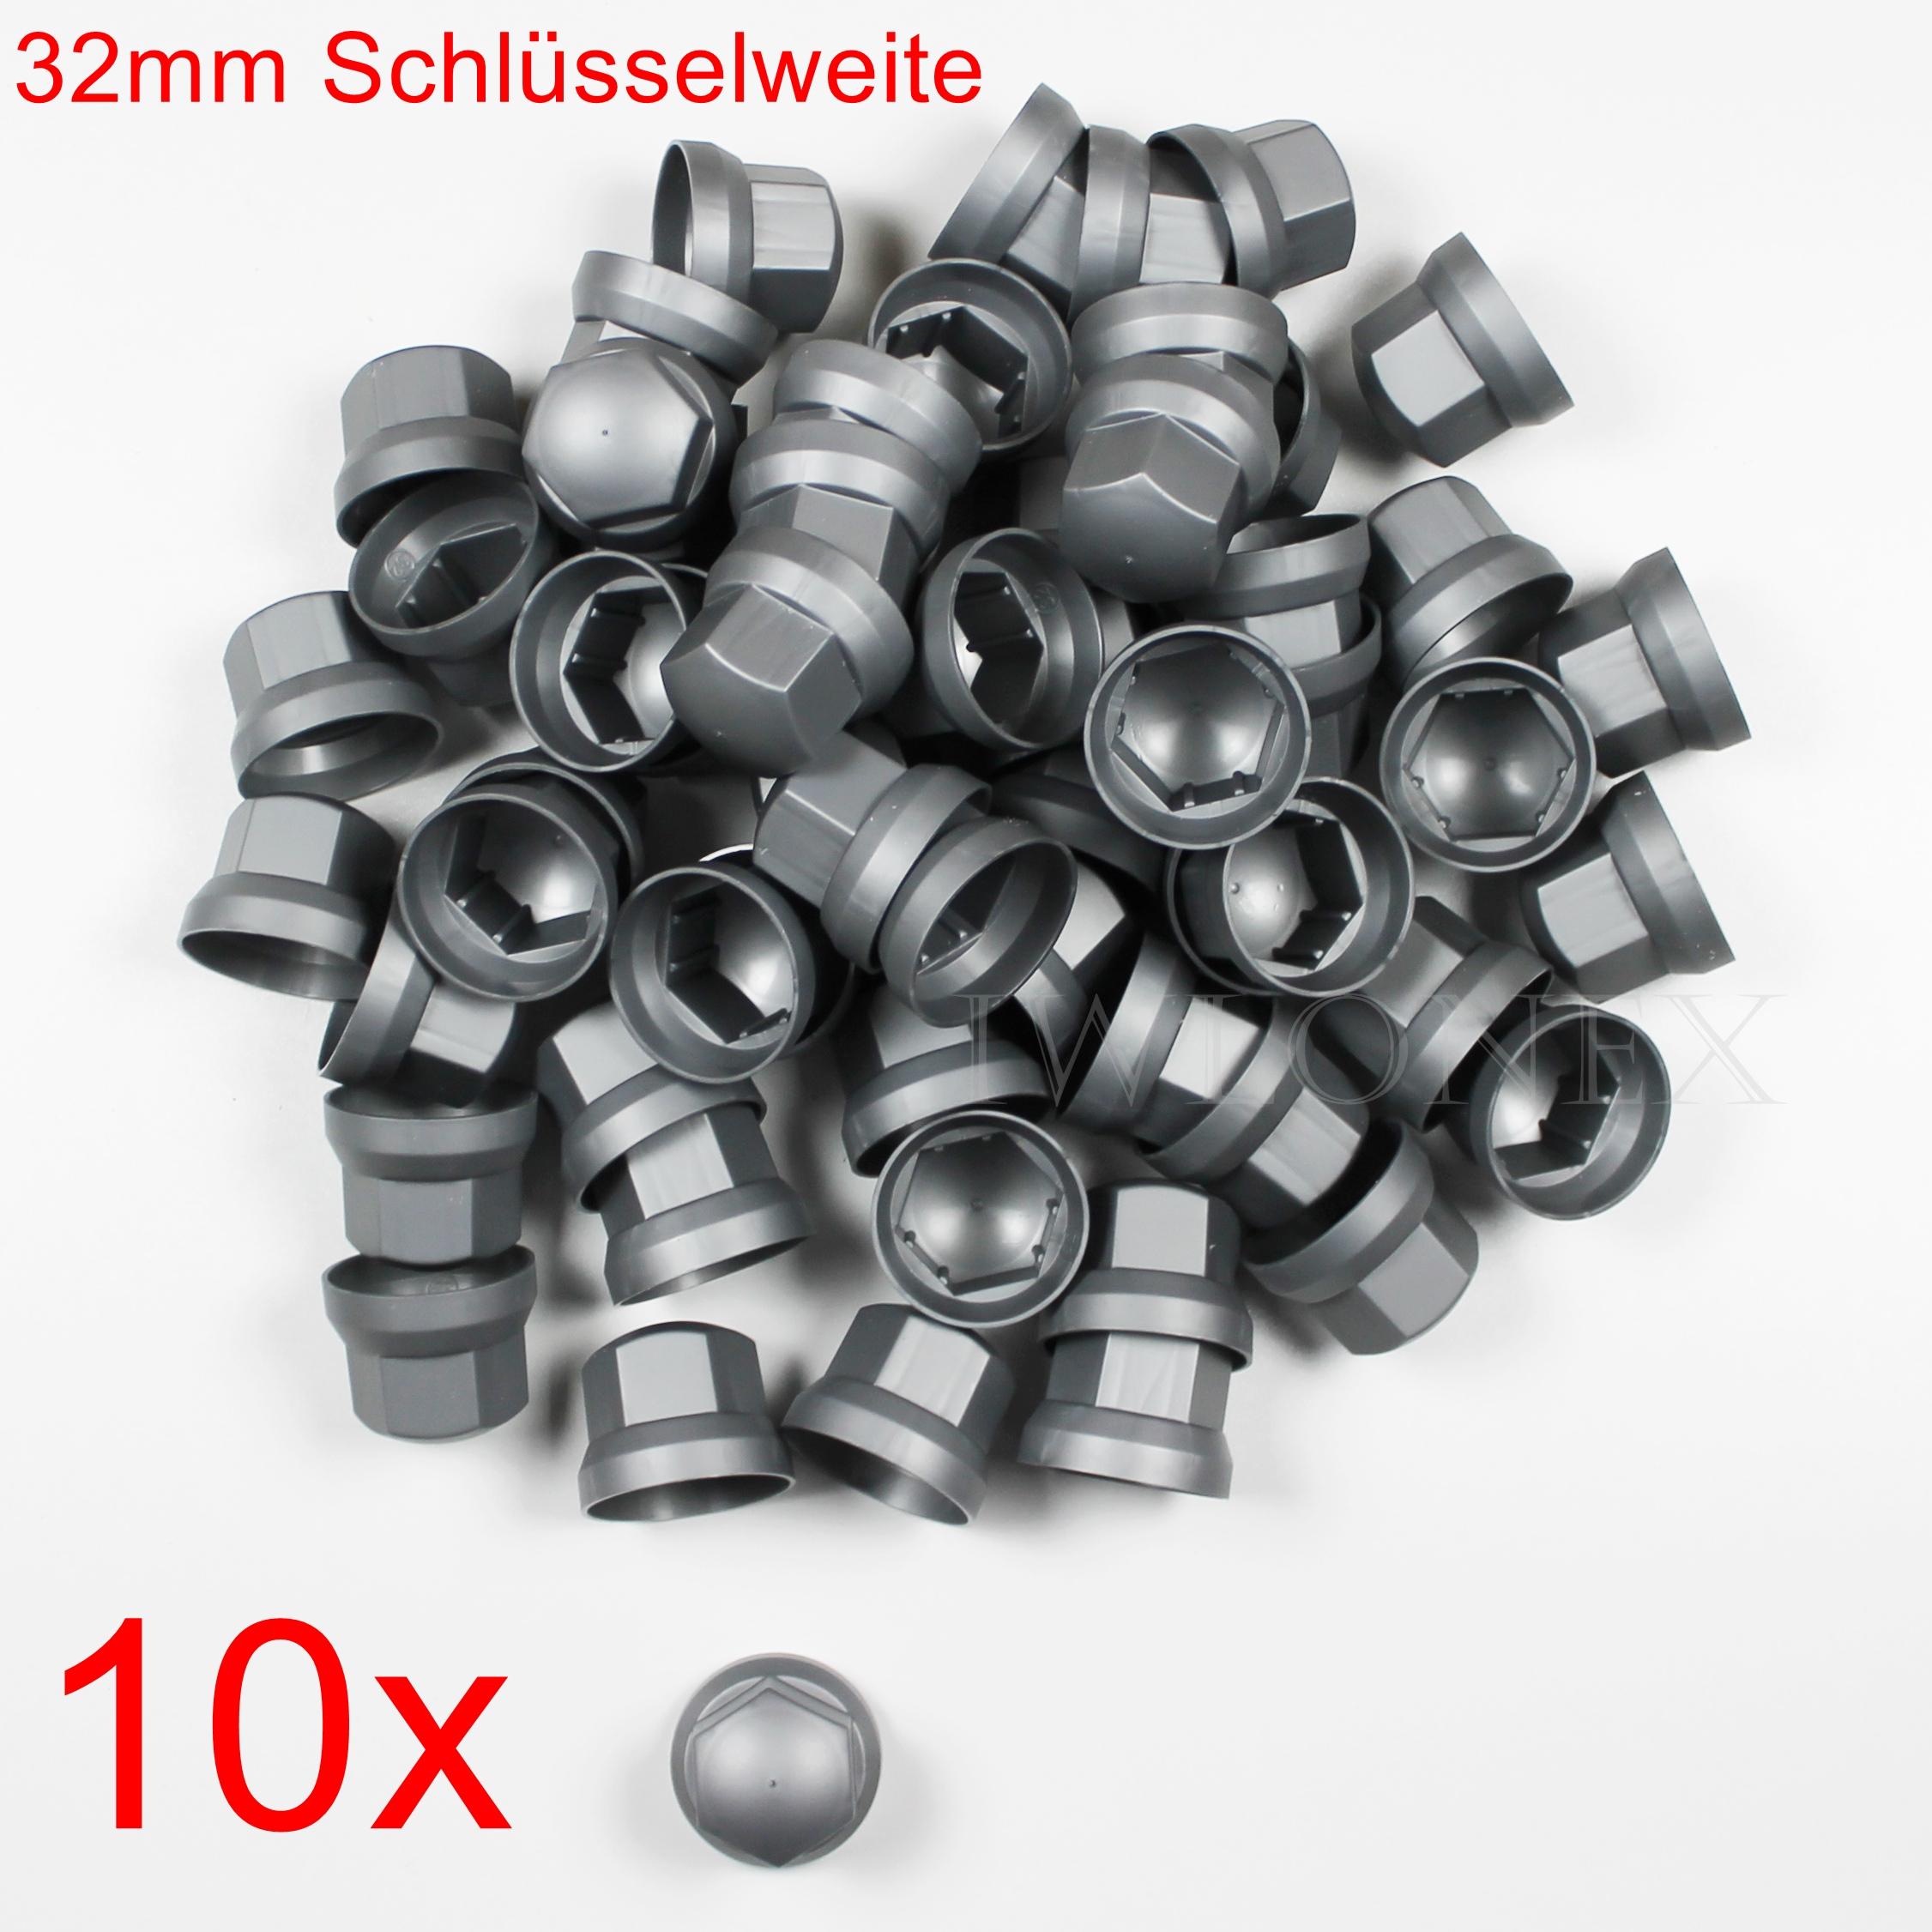 IMG 0267 - 10x RADMUTTERKAPPEN 32mm HÖHE 43mm Grau